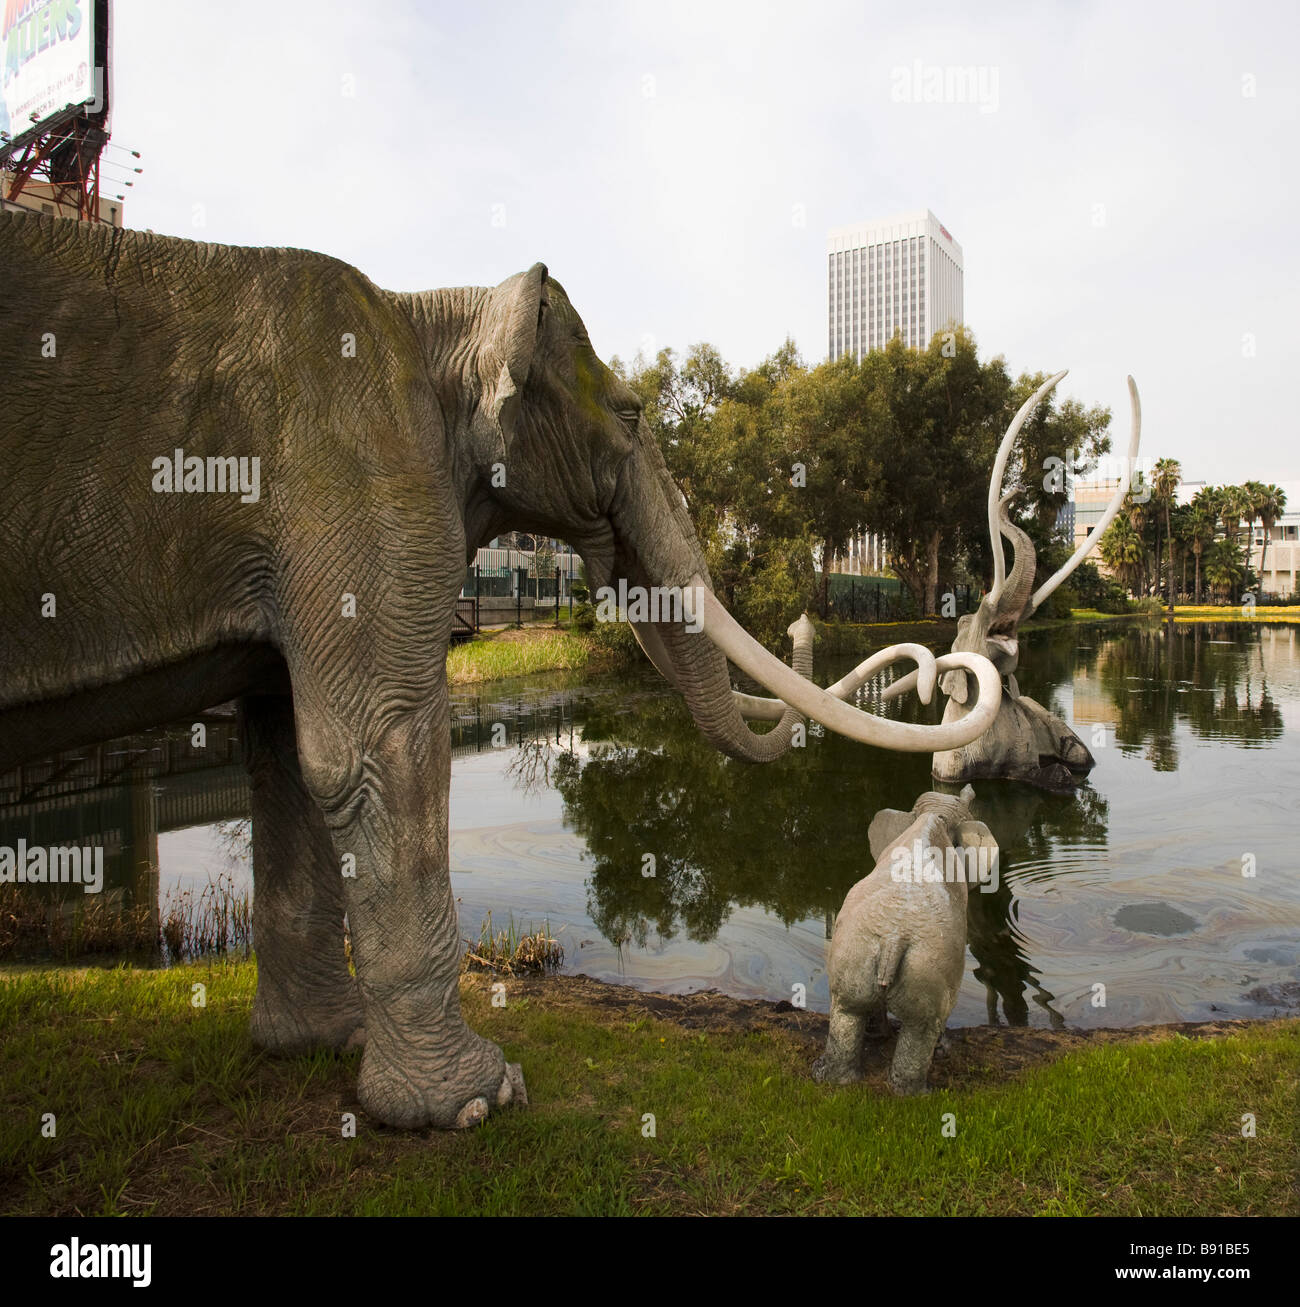 Los Angeles Natural History Museum La Brea Tar Pits